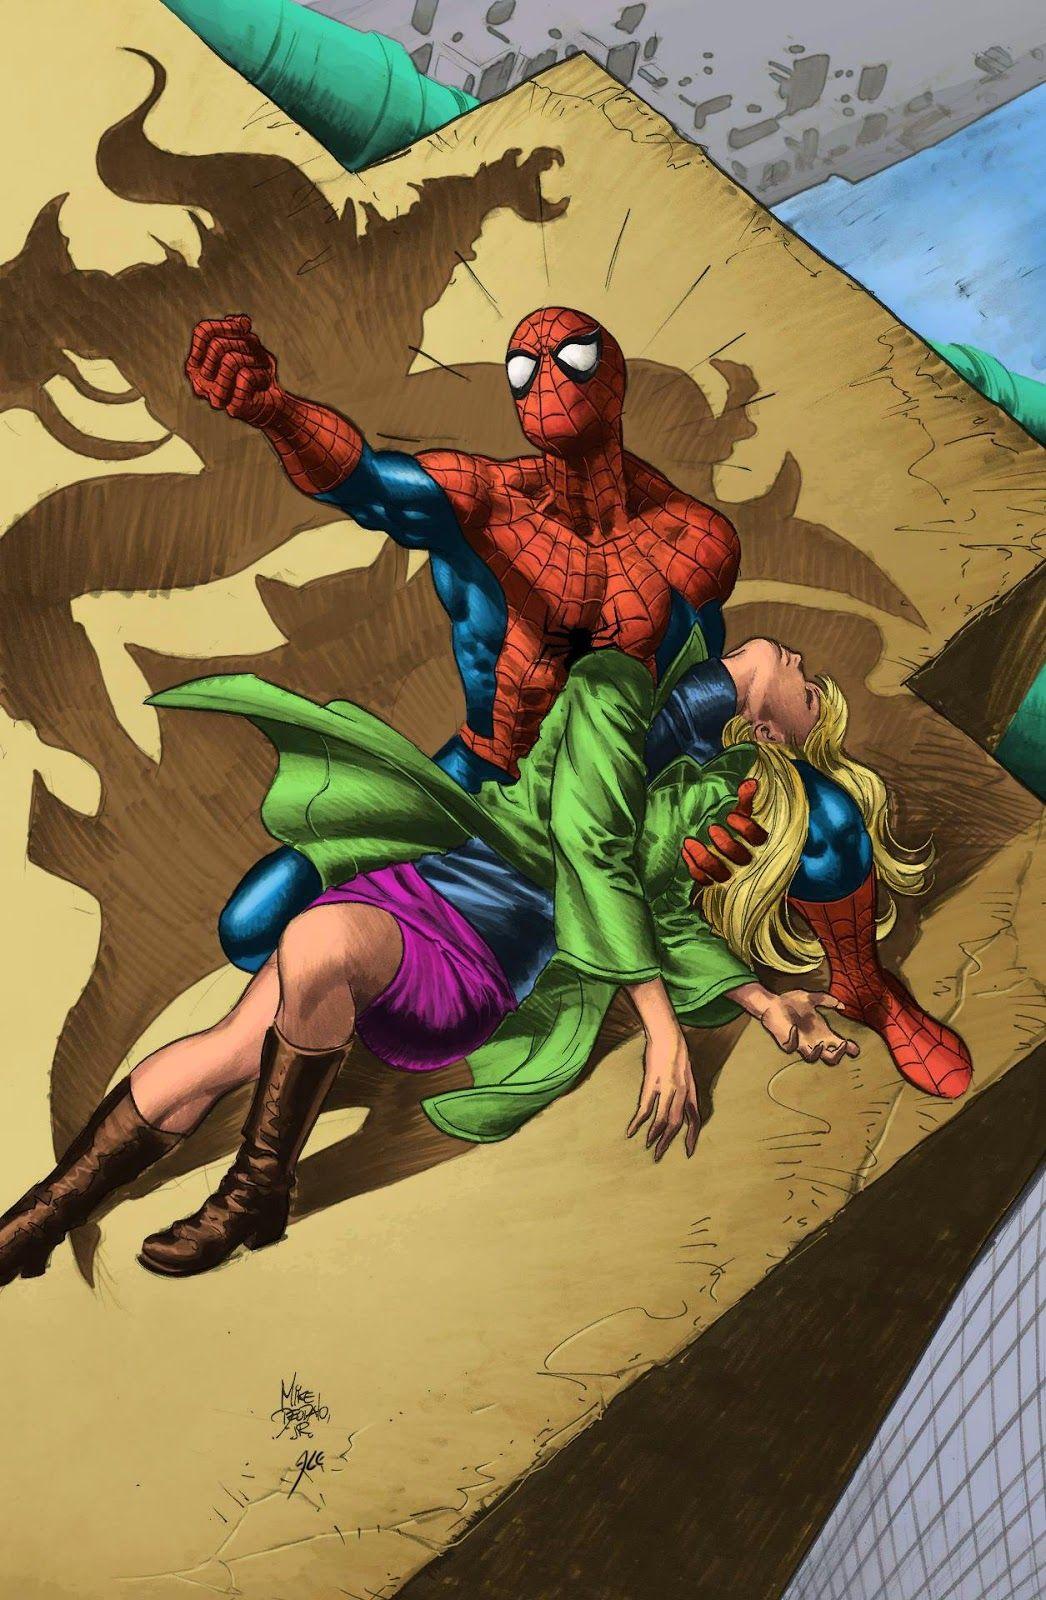 #Spiderman #Fan #Art. ( Spider-Man: Death of Gwen Stacy) By: Mike Deodato Jr & Alexandre Palomaro. (THE * 5 * STÅR * ÅWARD * OF: * AW YEAH, IT'S MAJOR ÅWESOMENESS!!!™)[THANK Ü 4 PINNING!!!<·><]<©>ÅÅÅ+(OB4E)